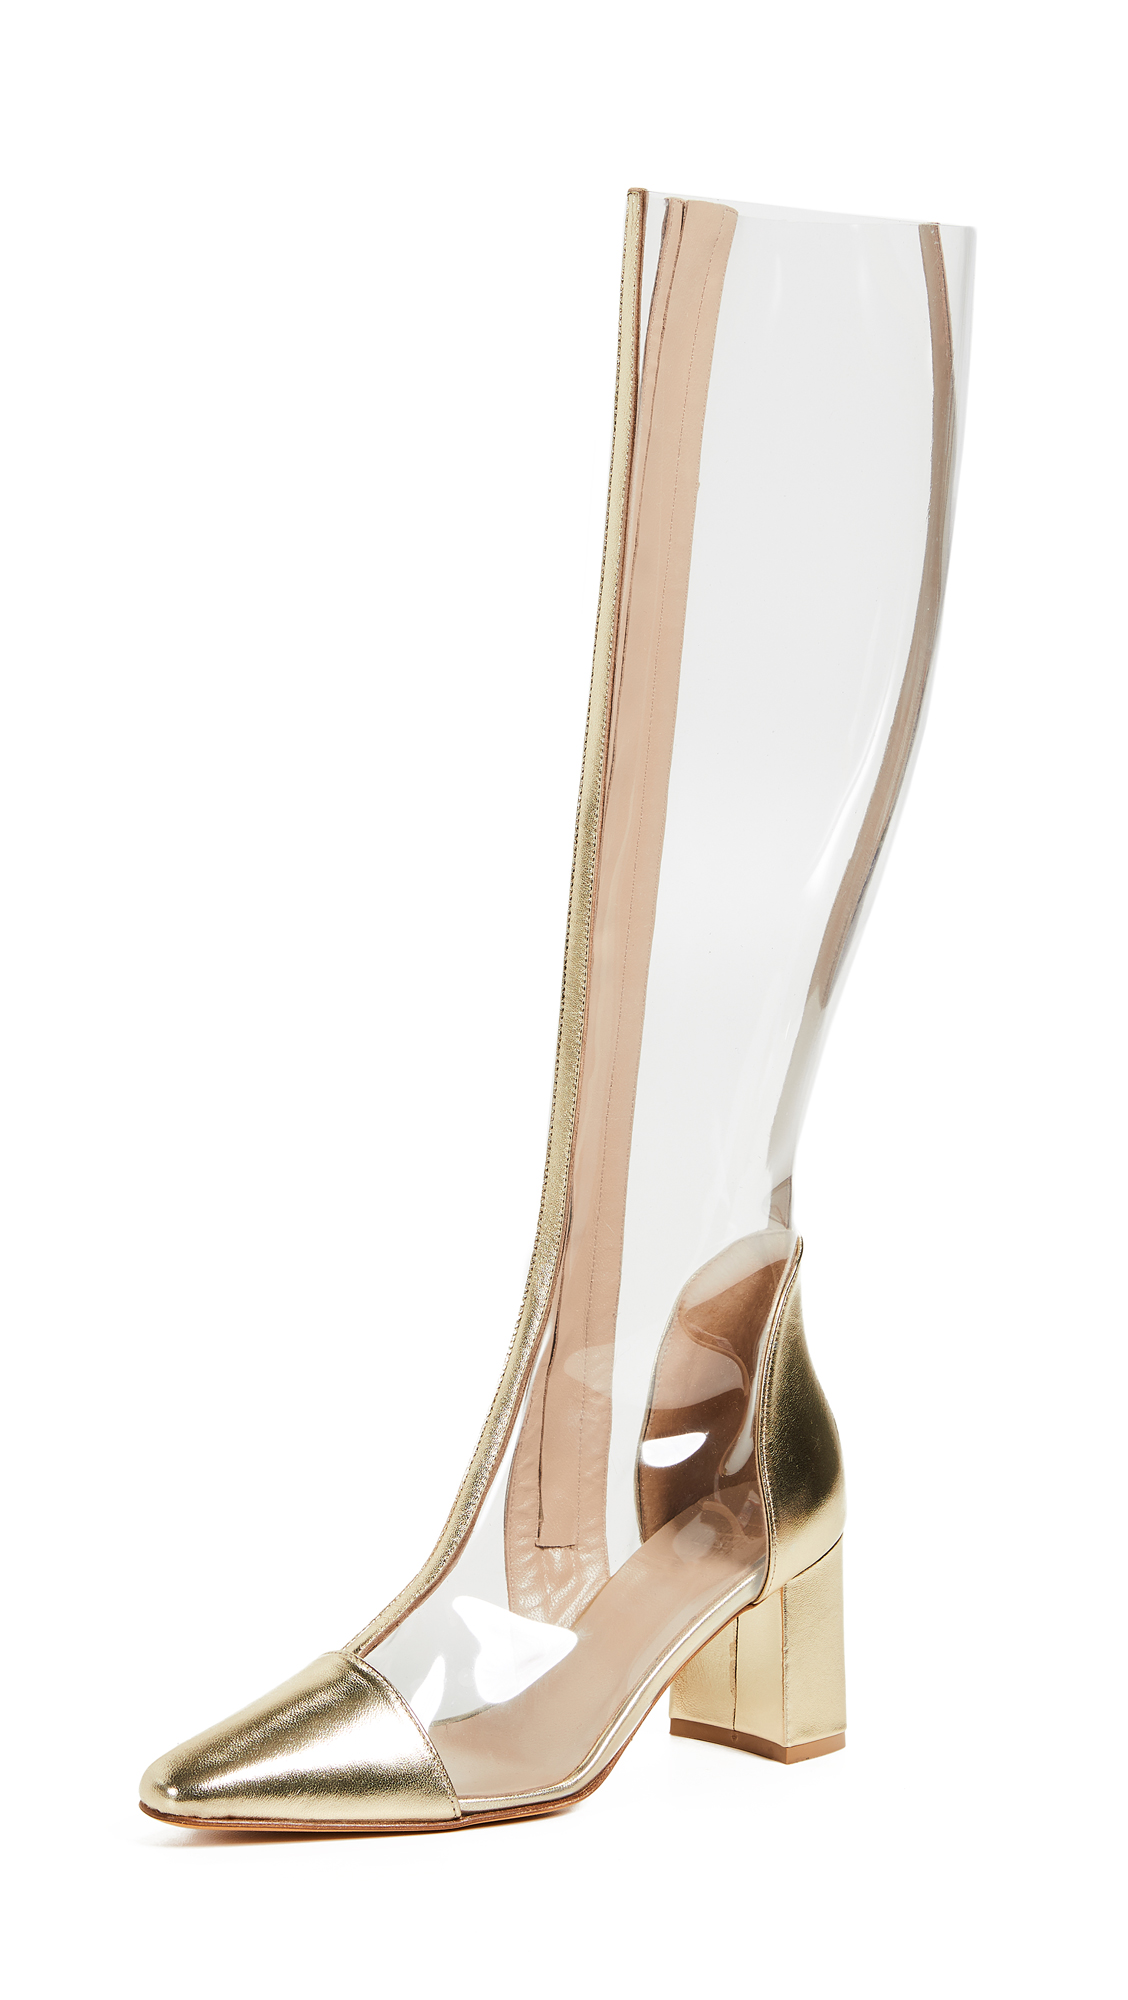 Maryam Nassir Zadeh Jupiter Boots - Clear/Gold